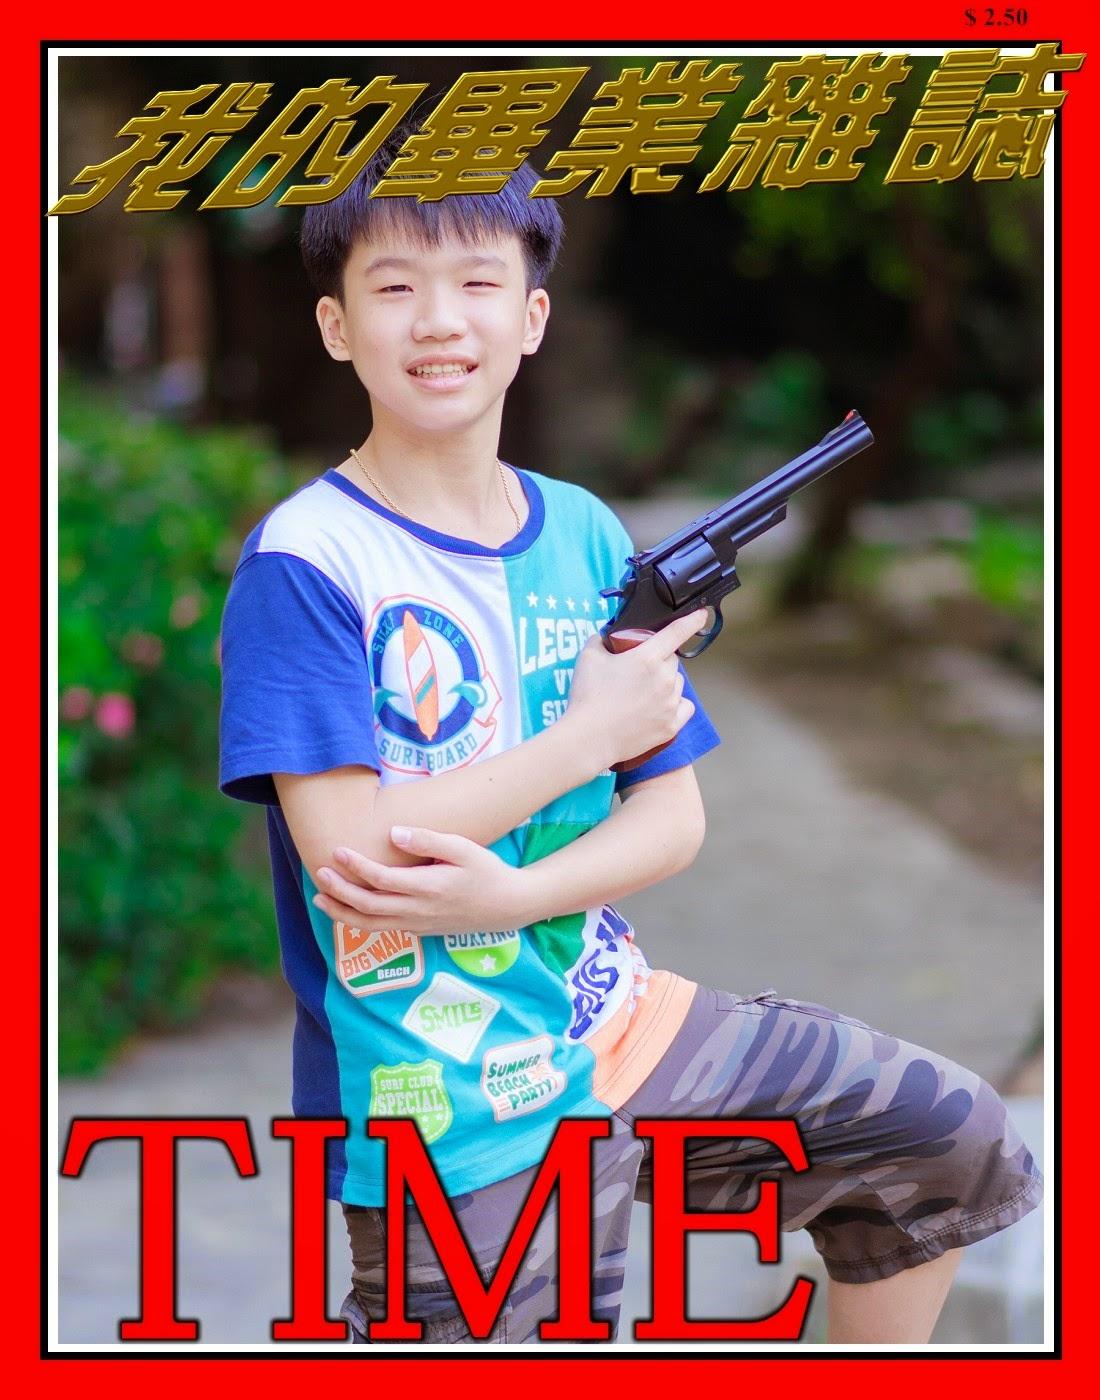 畢業雜誌6514 - Magazine cover